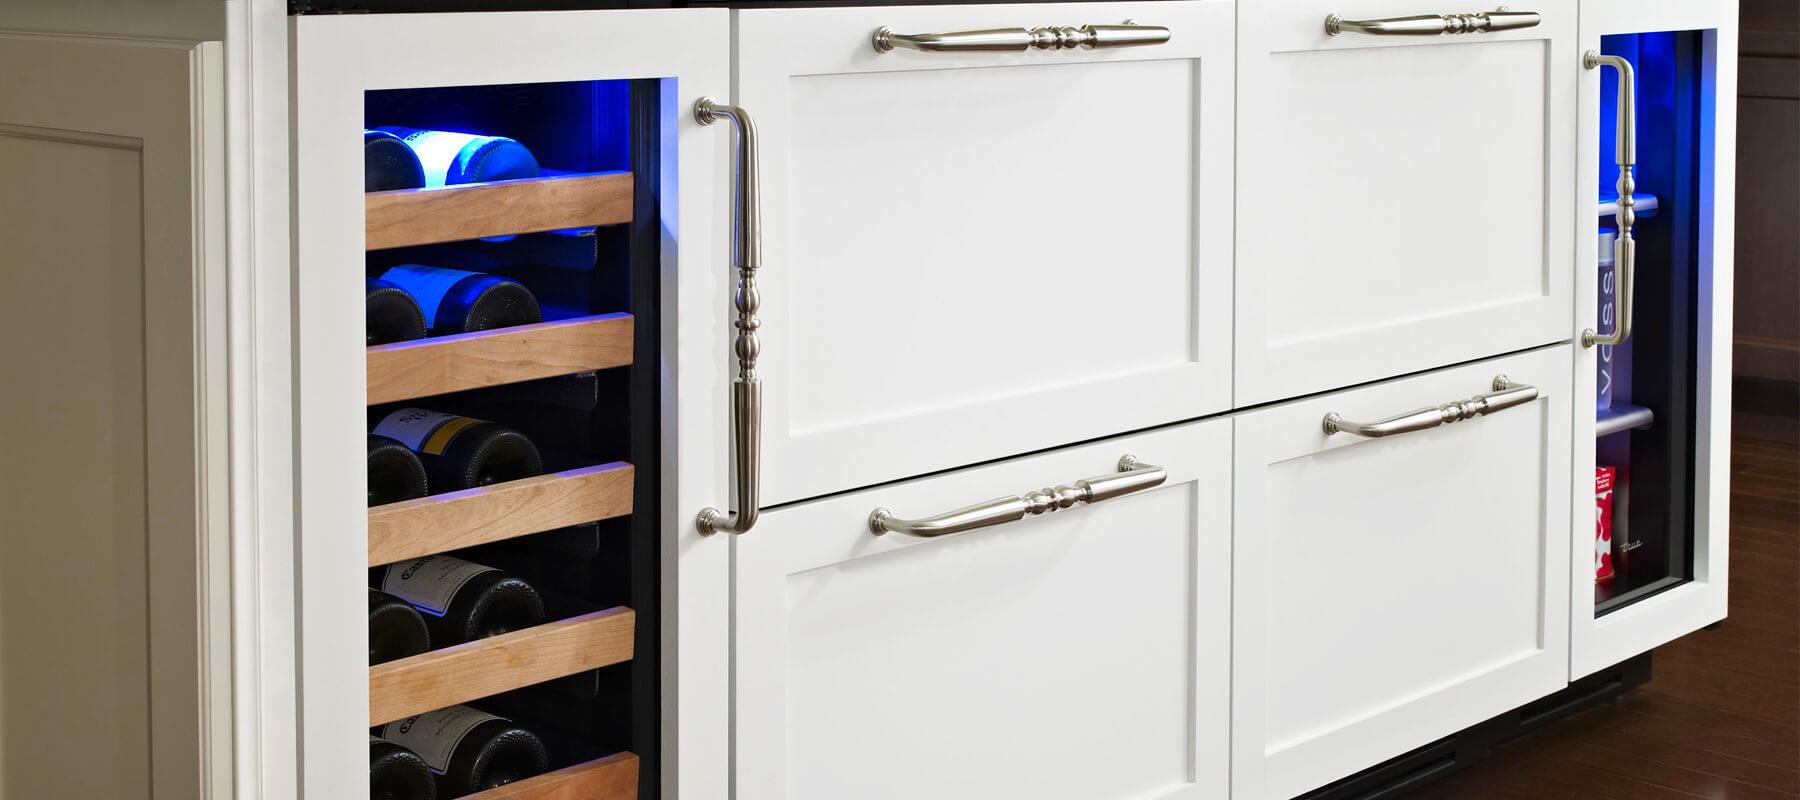 Built in Wine Refrigerator Undercounter San Francisco | Built-in Refrigerator Repair